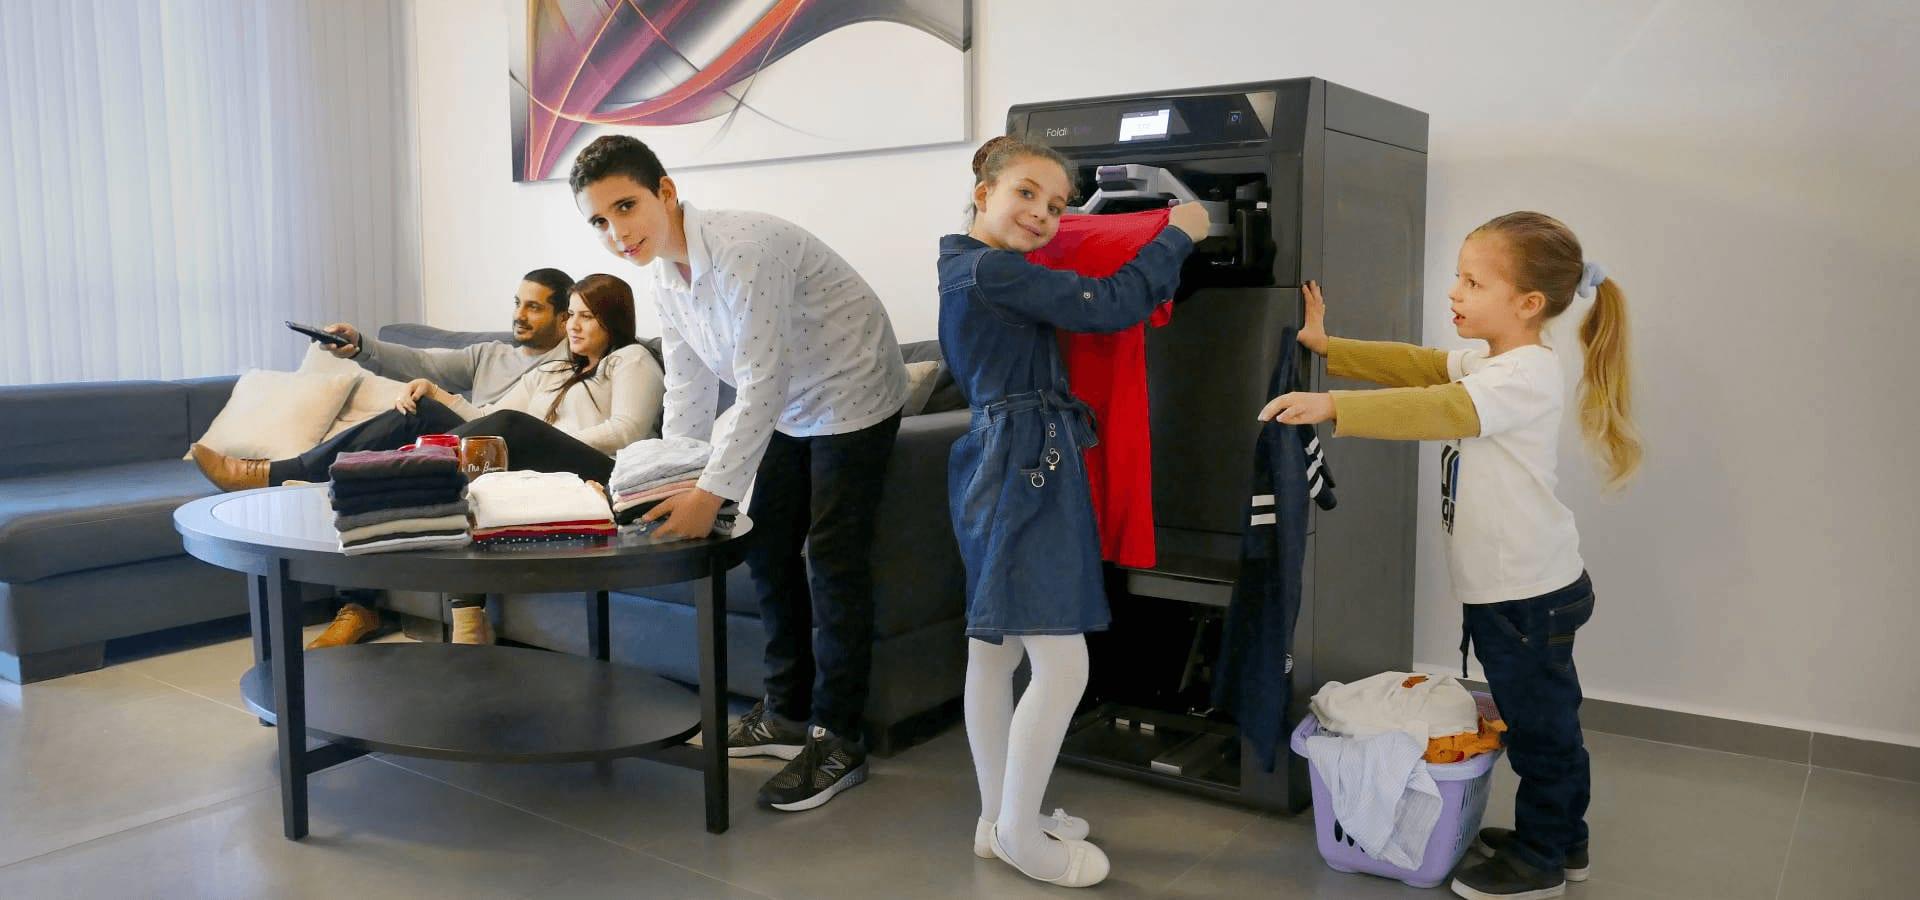 squarerooms foldimate family laundry robot automatic folder